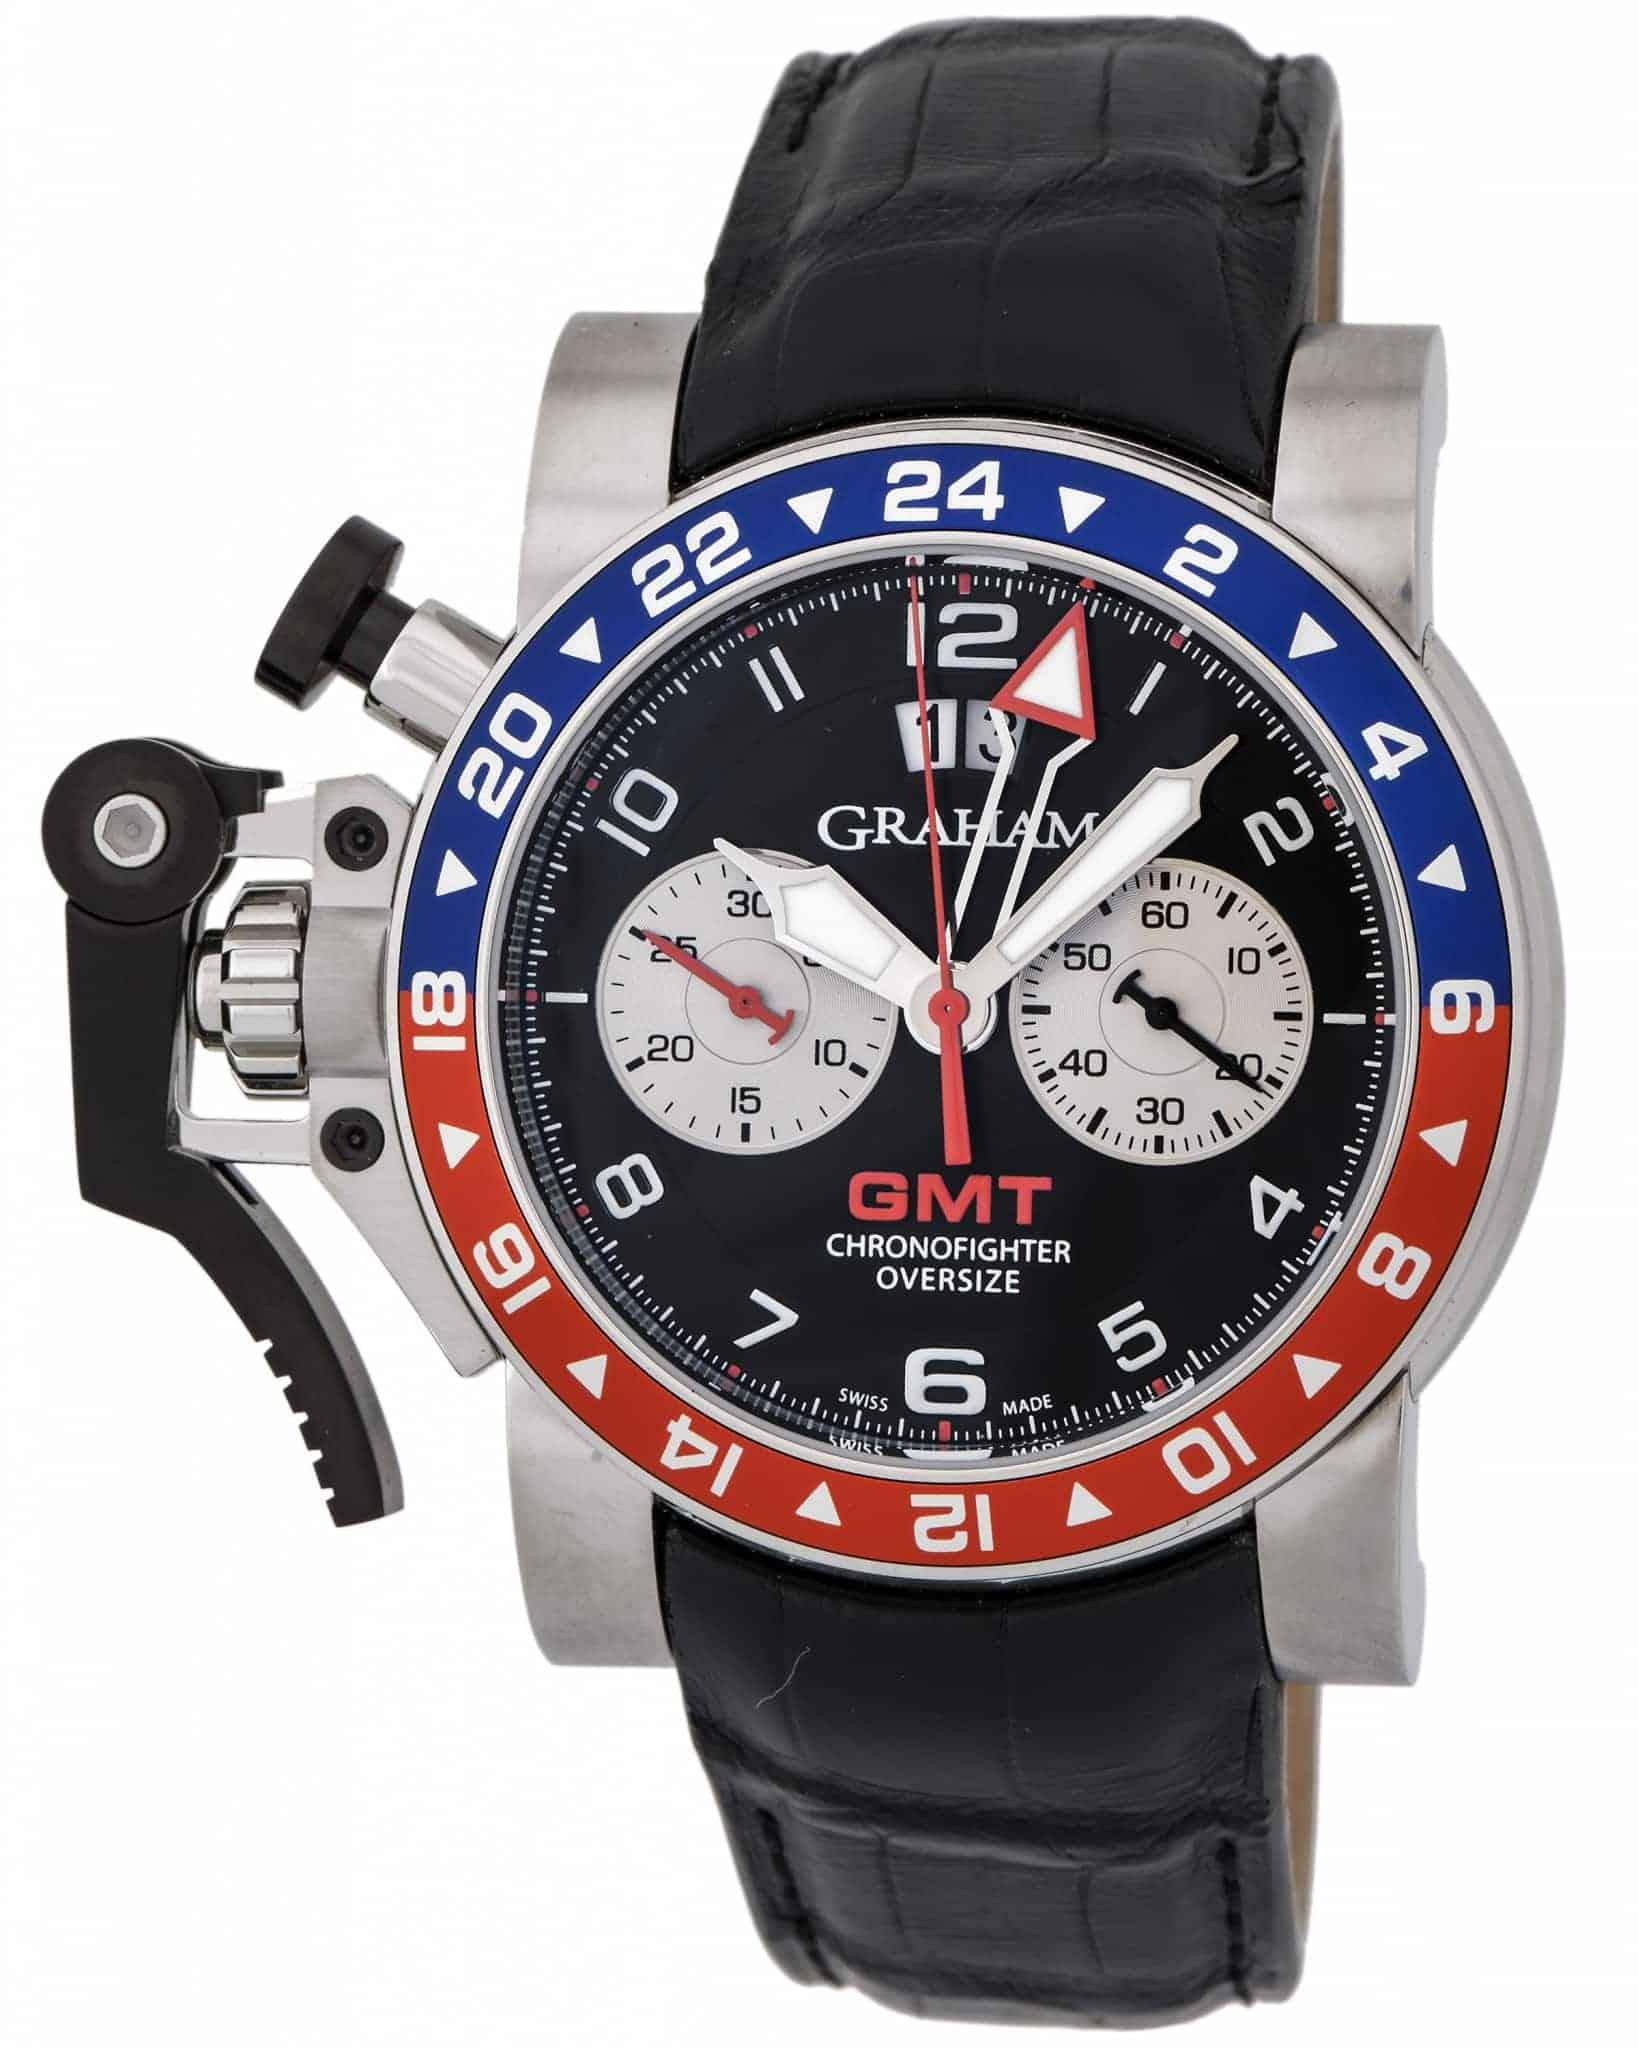 Graham Chronofighter Oversize GMT Chronograph Men's Watch – 2OVHS.B39A